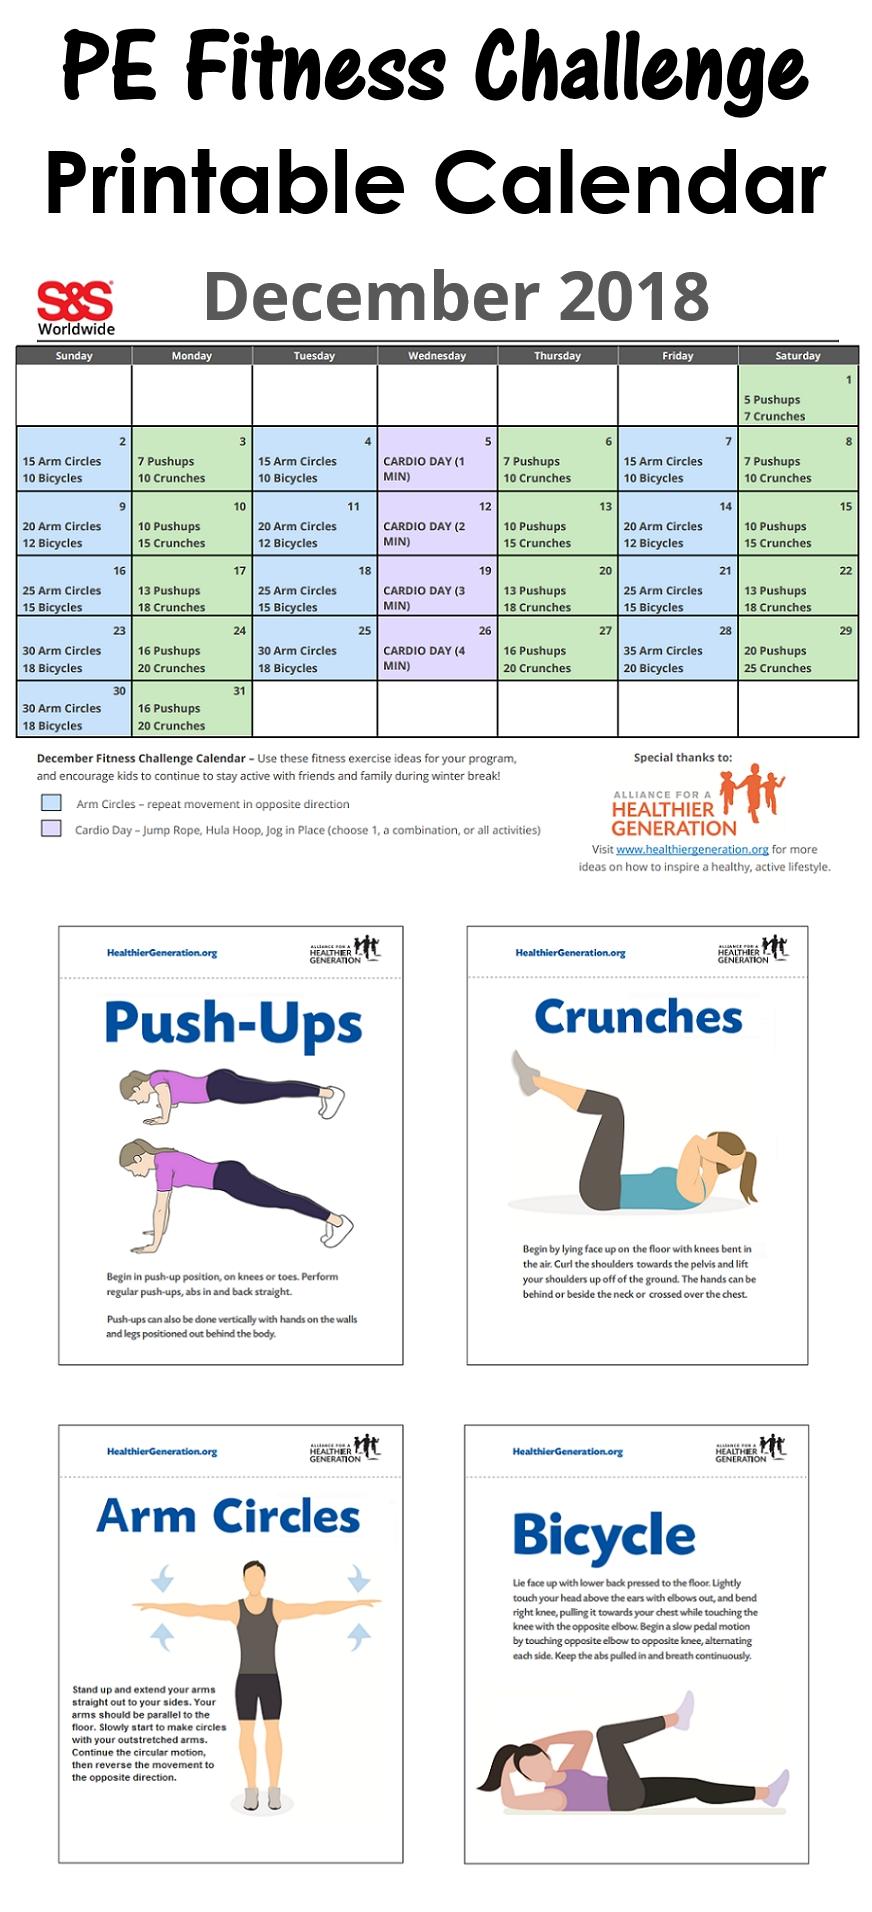 December Printable Fitness Challenge Calendar - S&S Blog